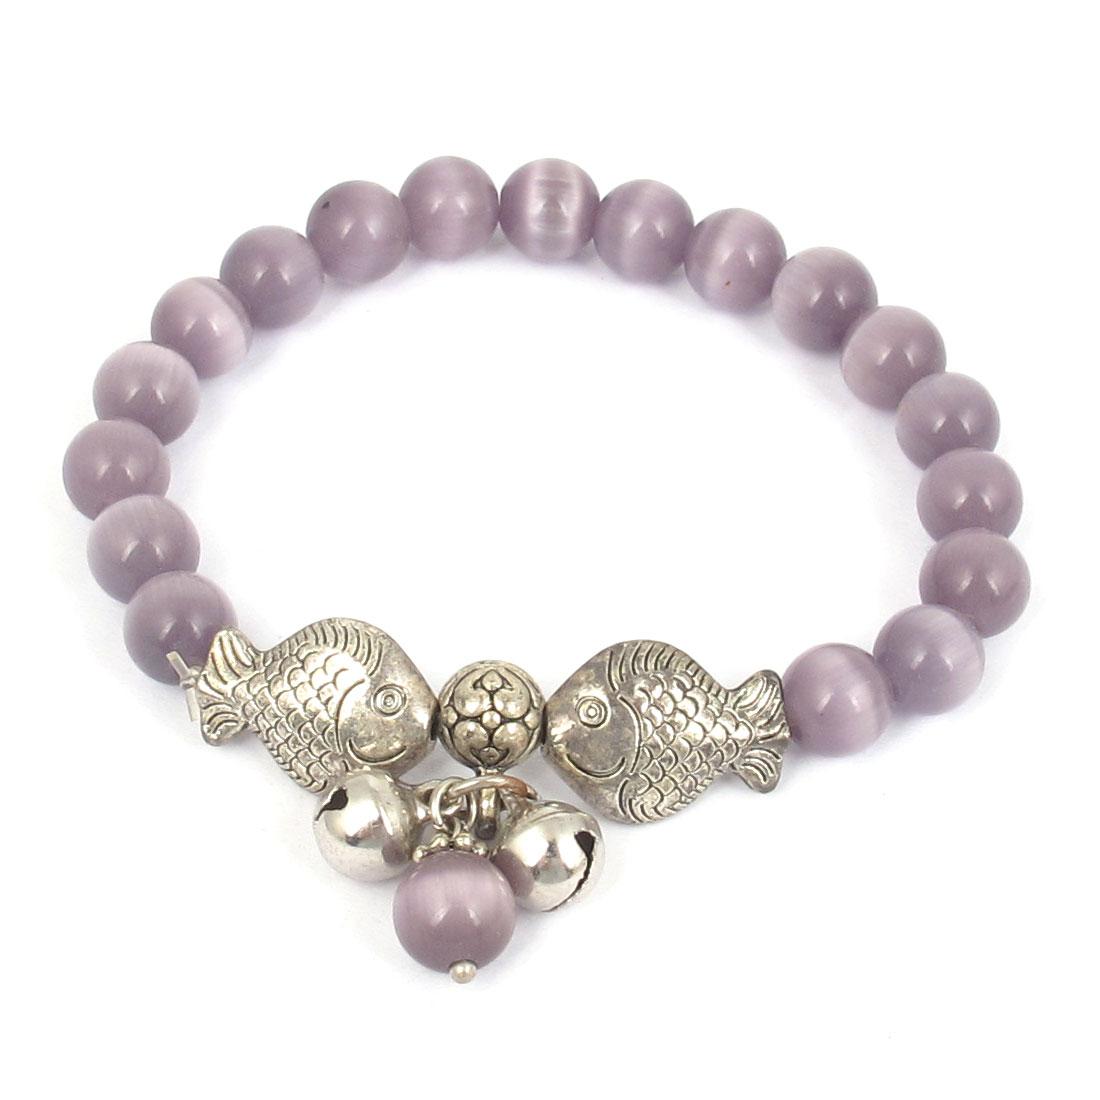 Fish Detail Round Opal Bead Wrist Ornament Bangle Bracelet Medium Purple Silver Tone for Women